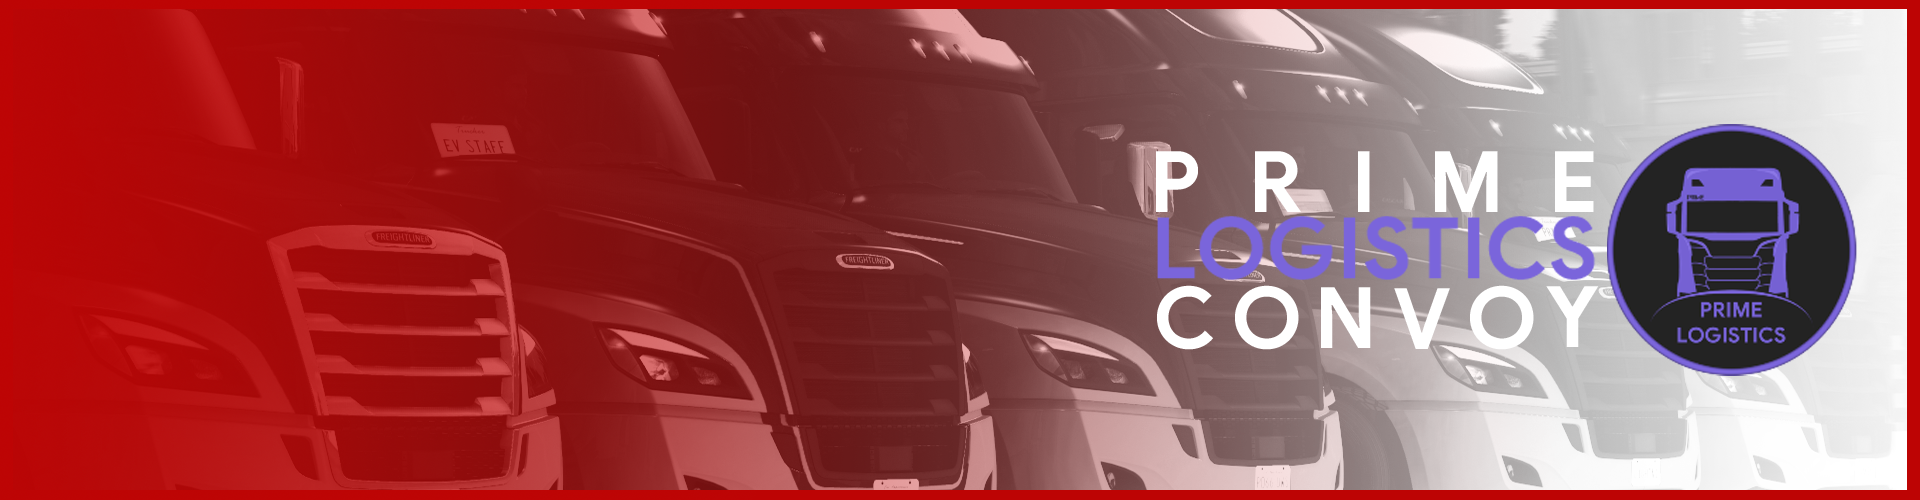 🟣 Prime Logistics ATS Convoy #12 Christmas Edition